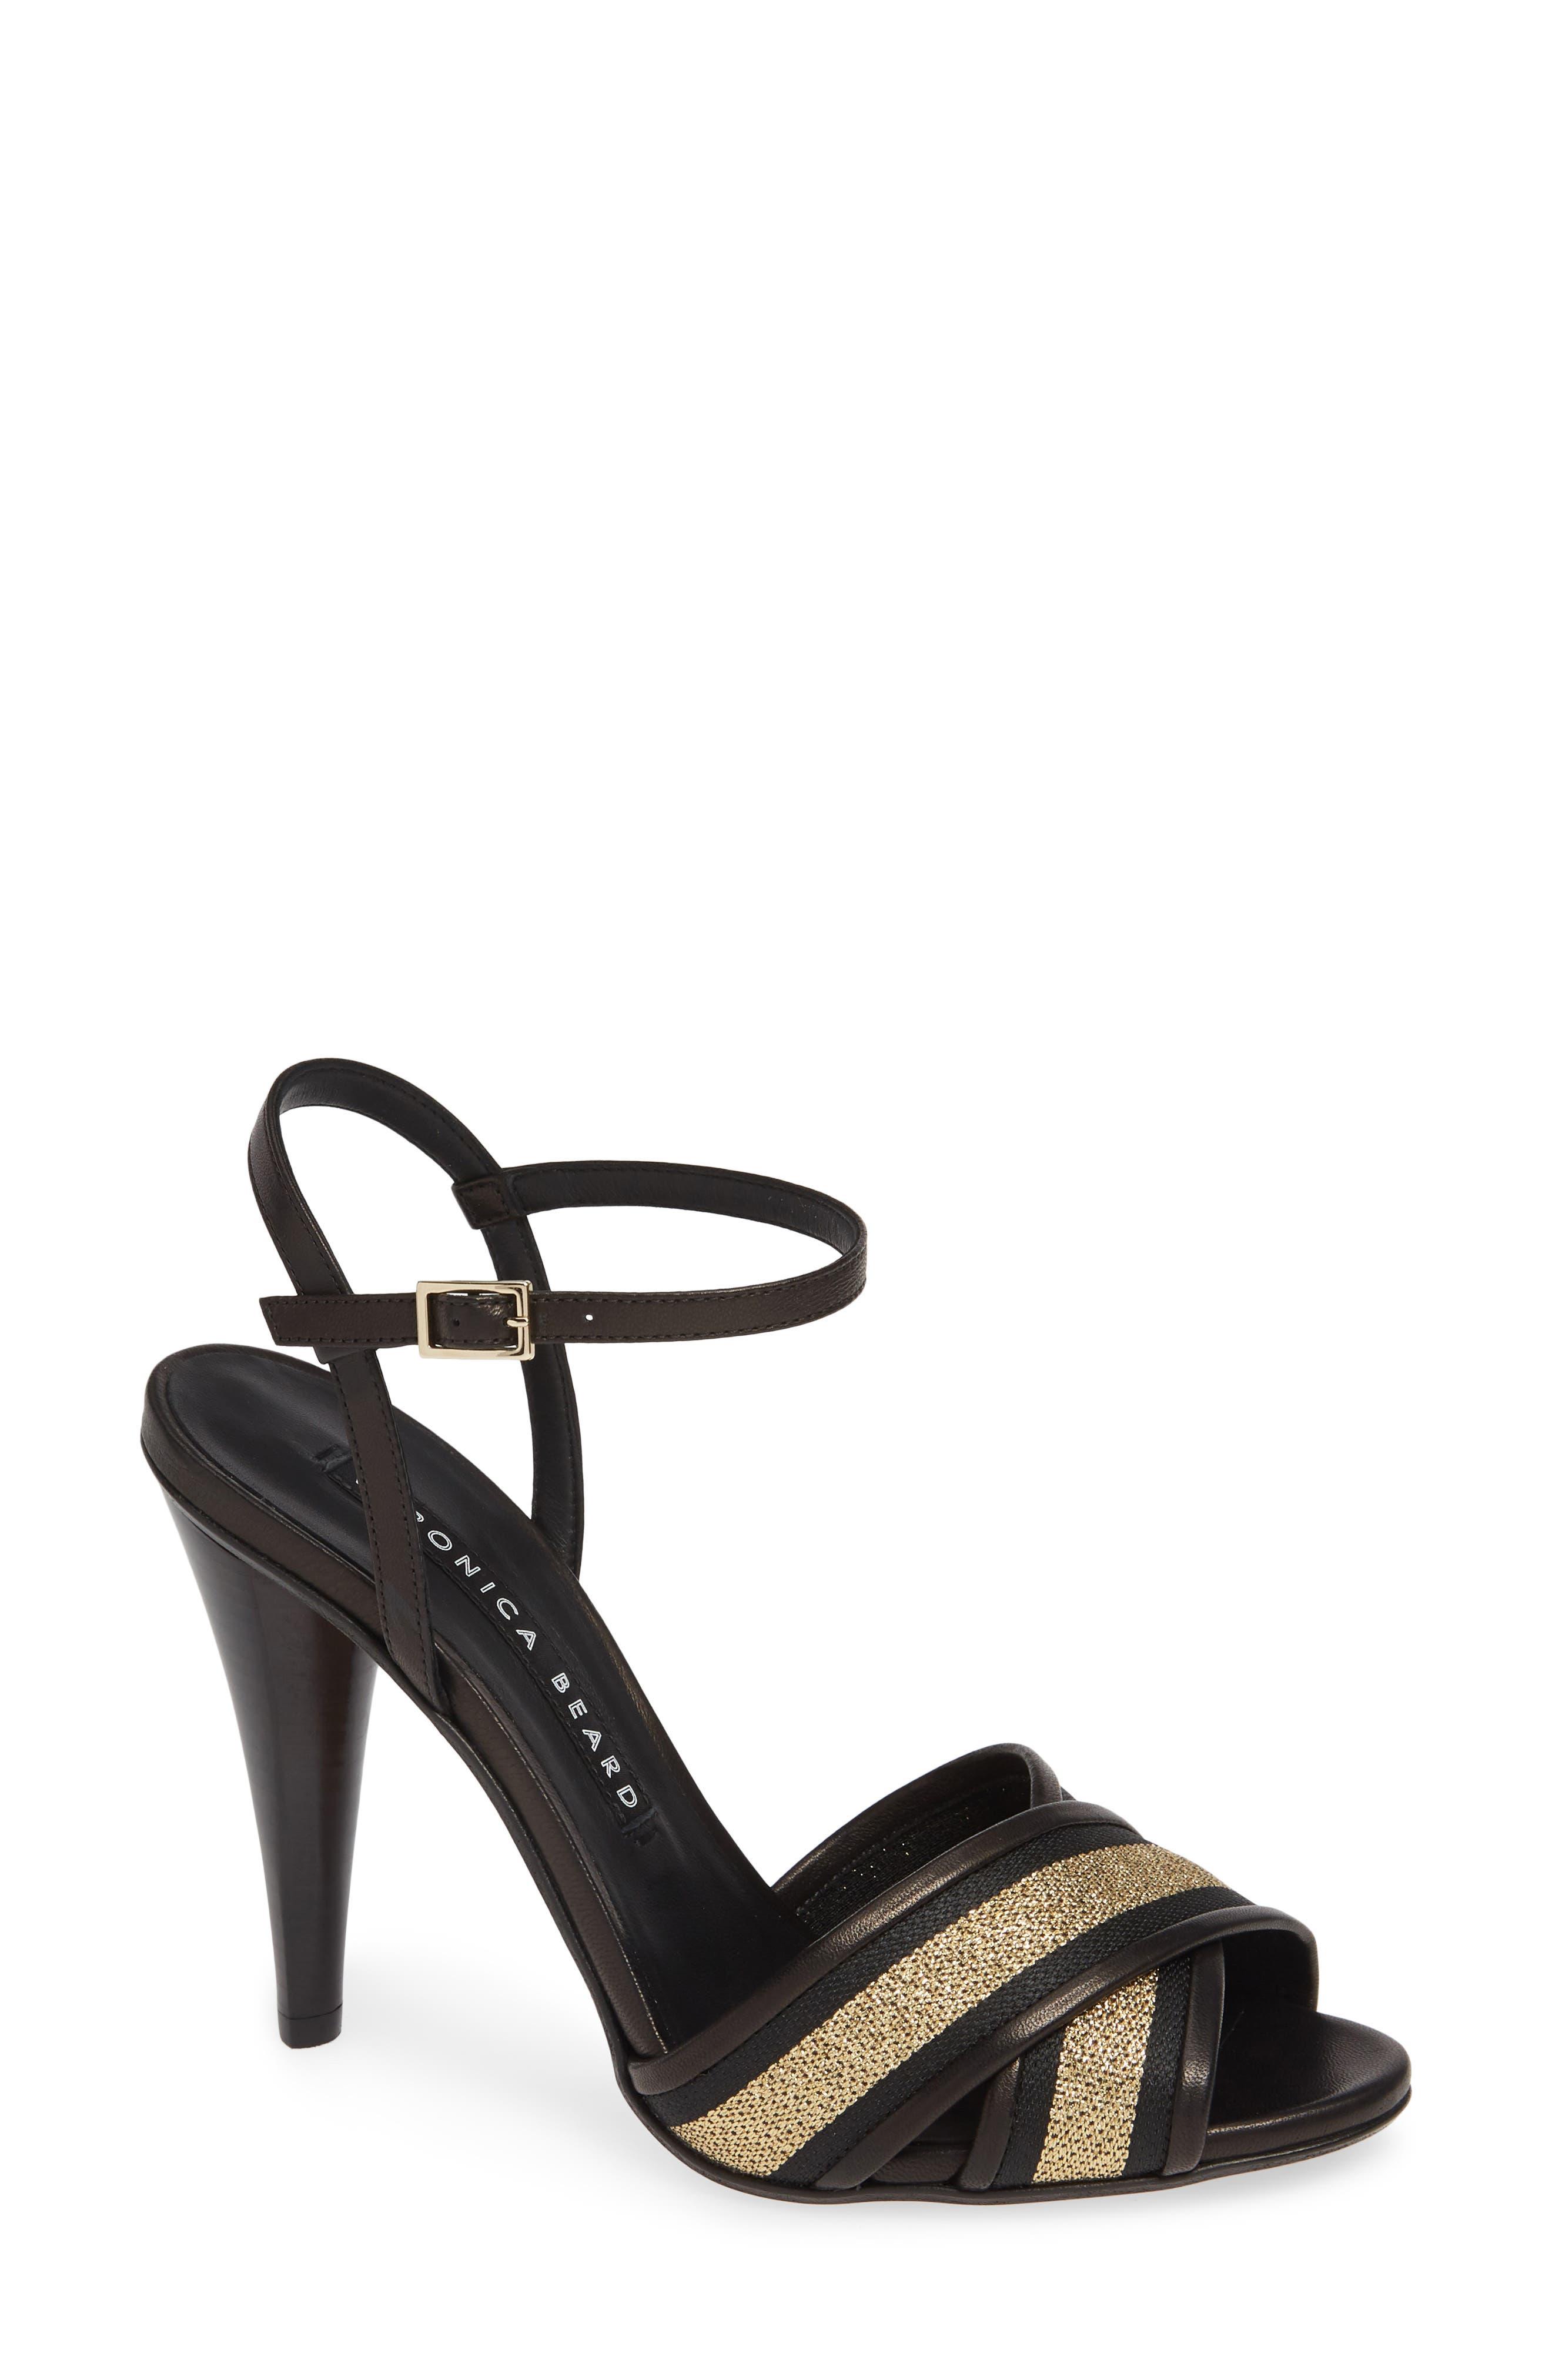 VERONICA BEARD Olympia Quarter Strap Sandal, Main, color, BLACK/ GOLD